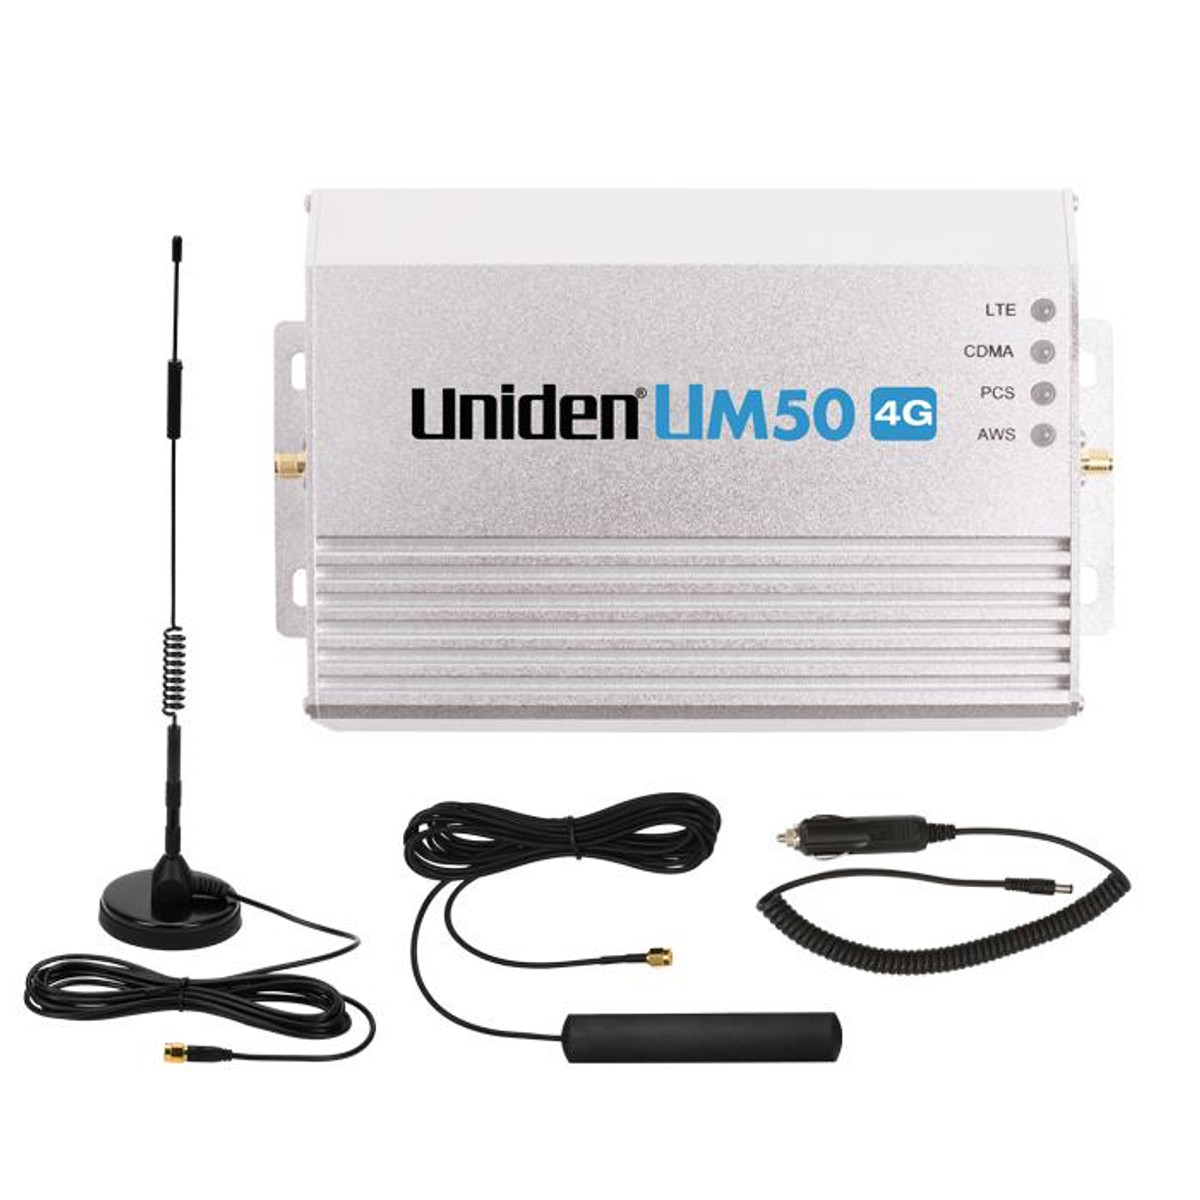 Uniden Uniden UM50 Vehicle Cellular Signal Booster Kit